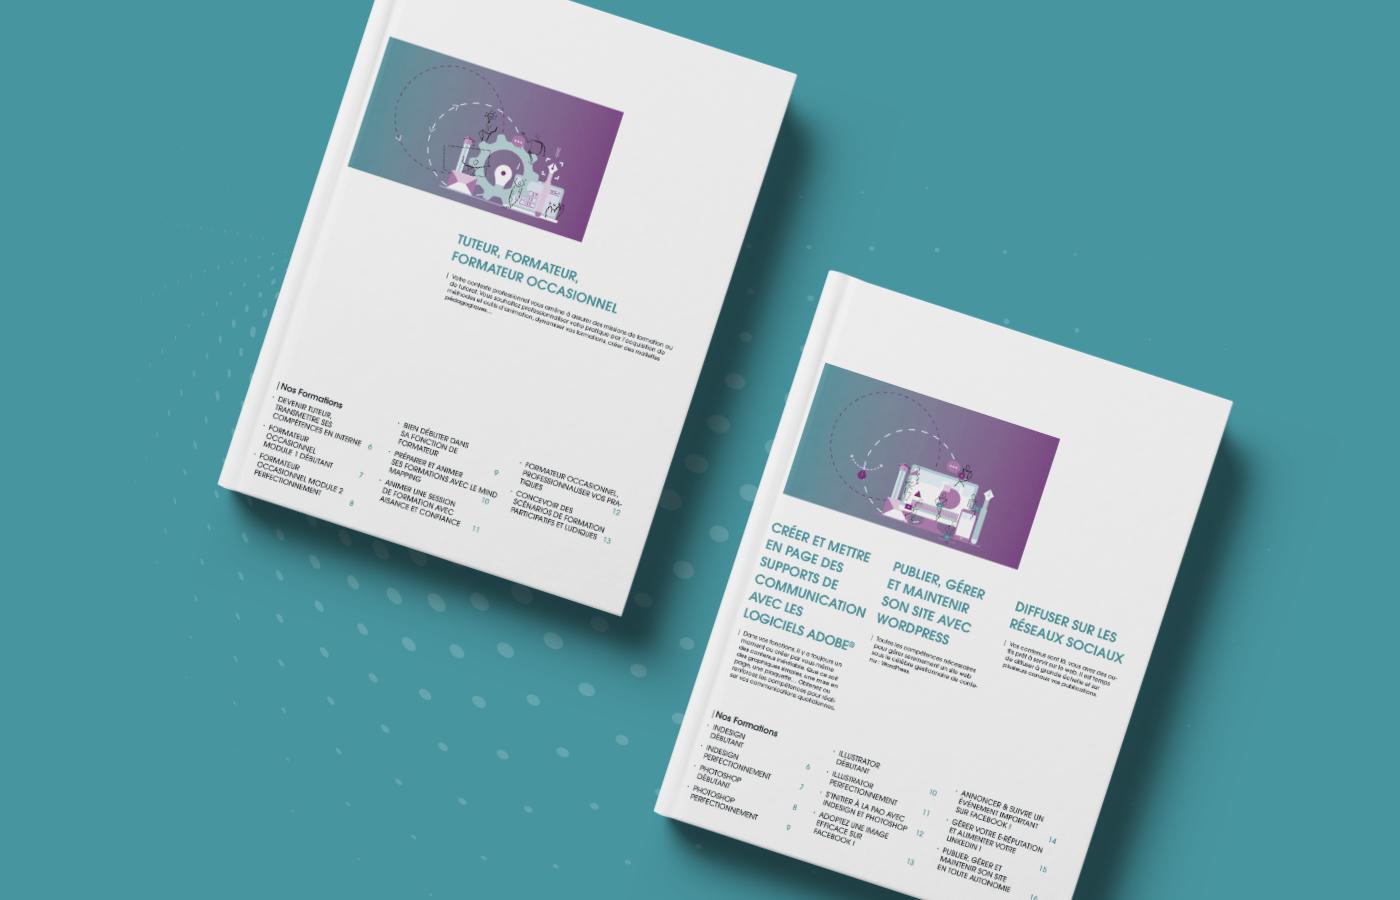 Formation Forsane - Catalogue des formations professionnelles